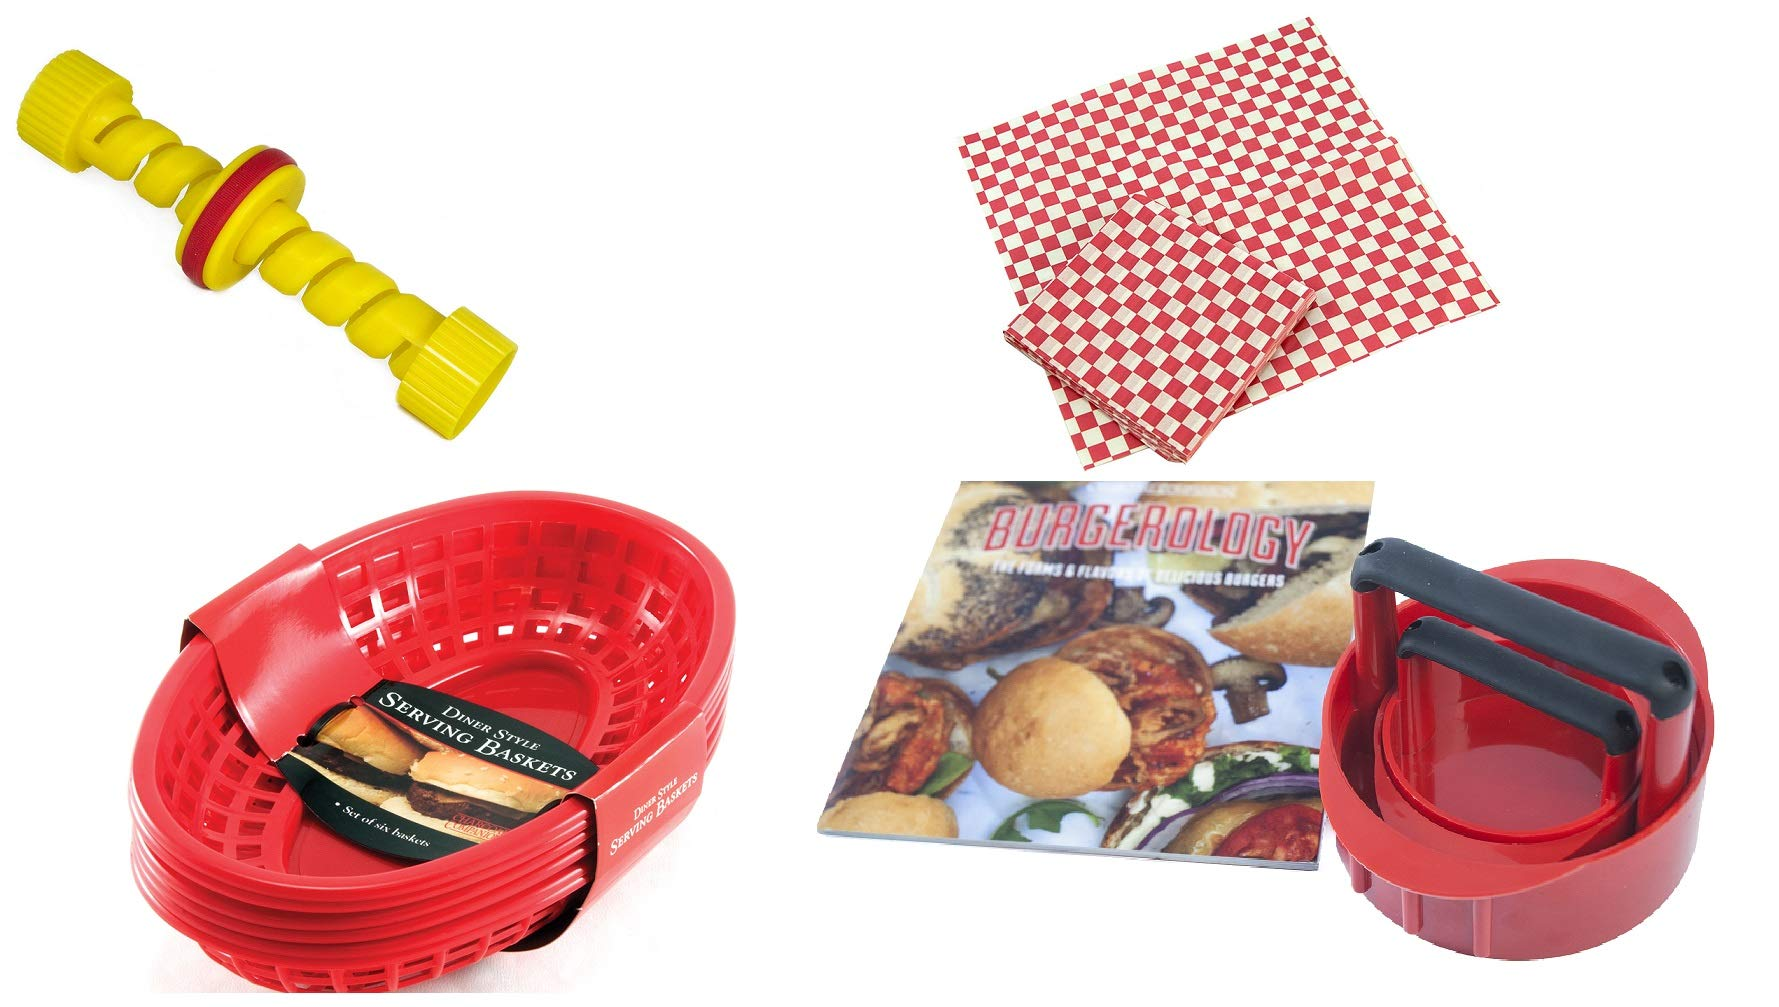 Charcoal Companion CC6689 Burger & Hotdog BBQ Gift Bundle Grill Accessories